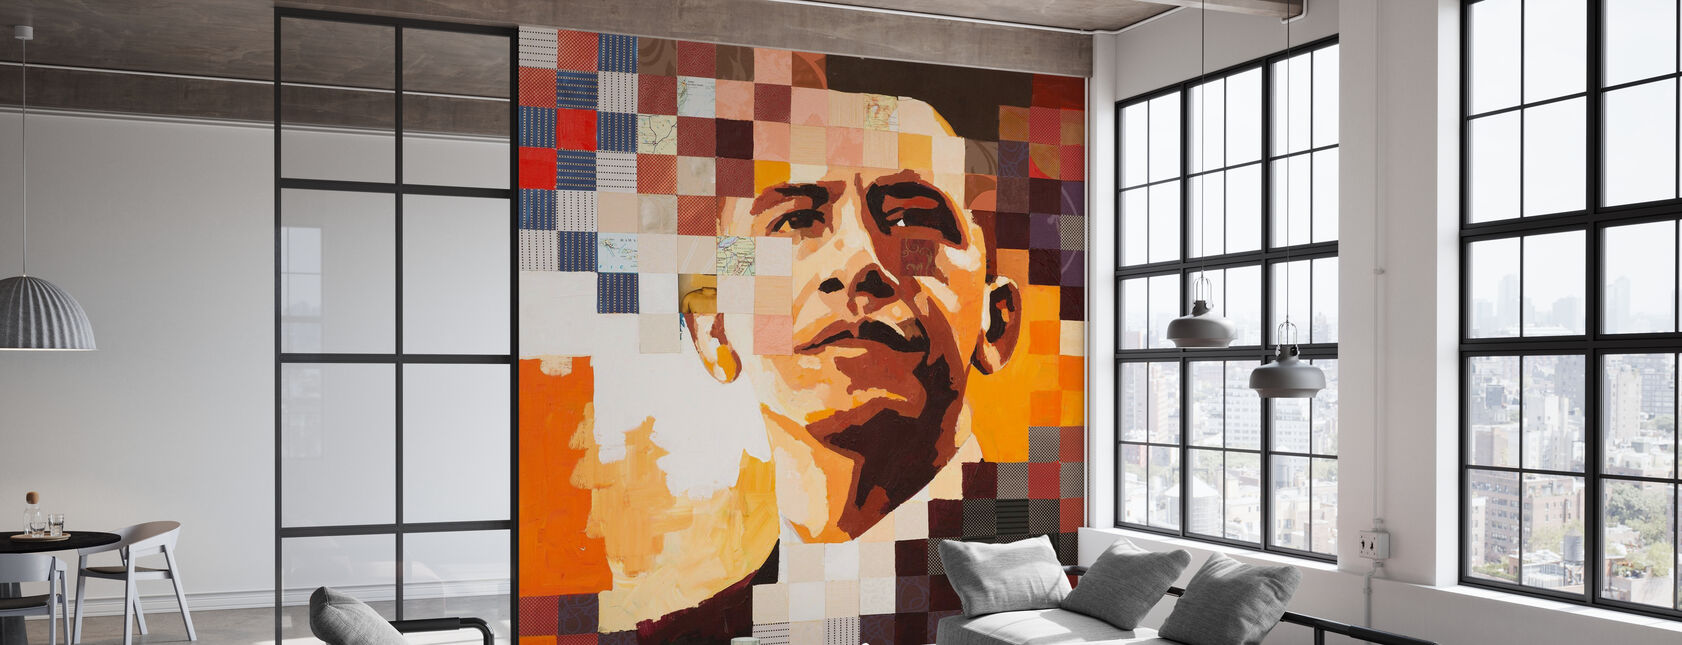 Mr Change - Wallpaper - Office